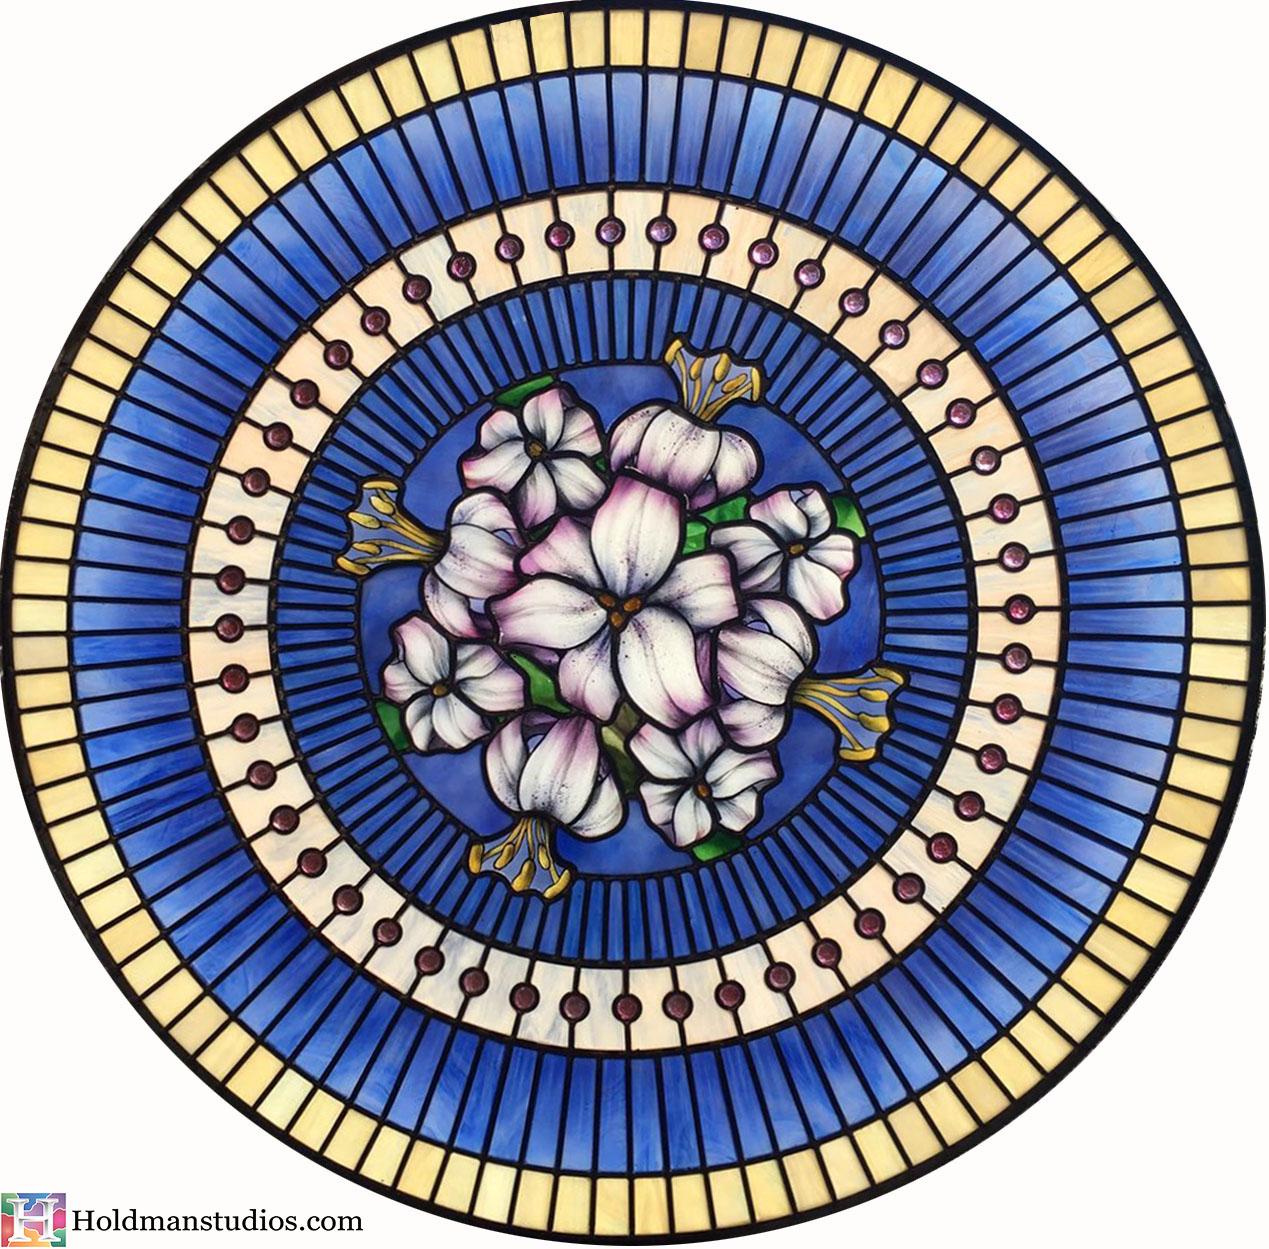 Holdman-Studios-Stained-Glass-Paris-LDS-Temple-Martagon-Lily-Flowers-Leaves-Sun-Moon-Stars-Round-Skylight-Window2.jpg